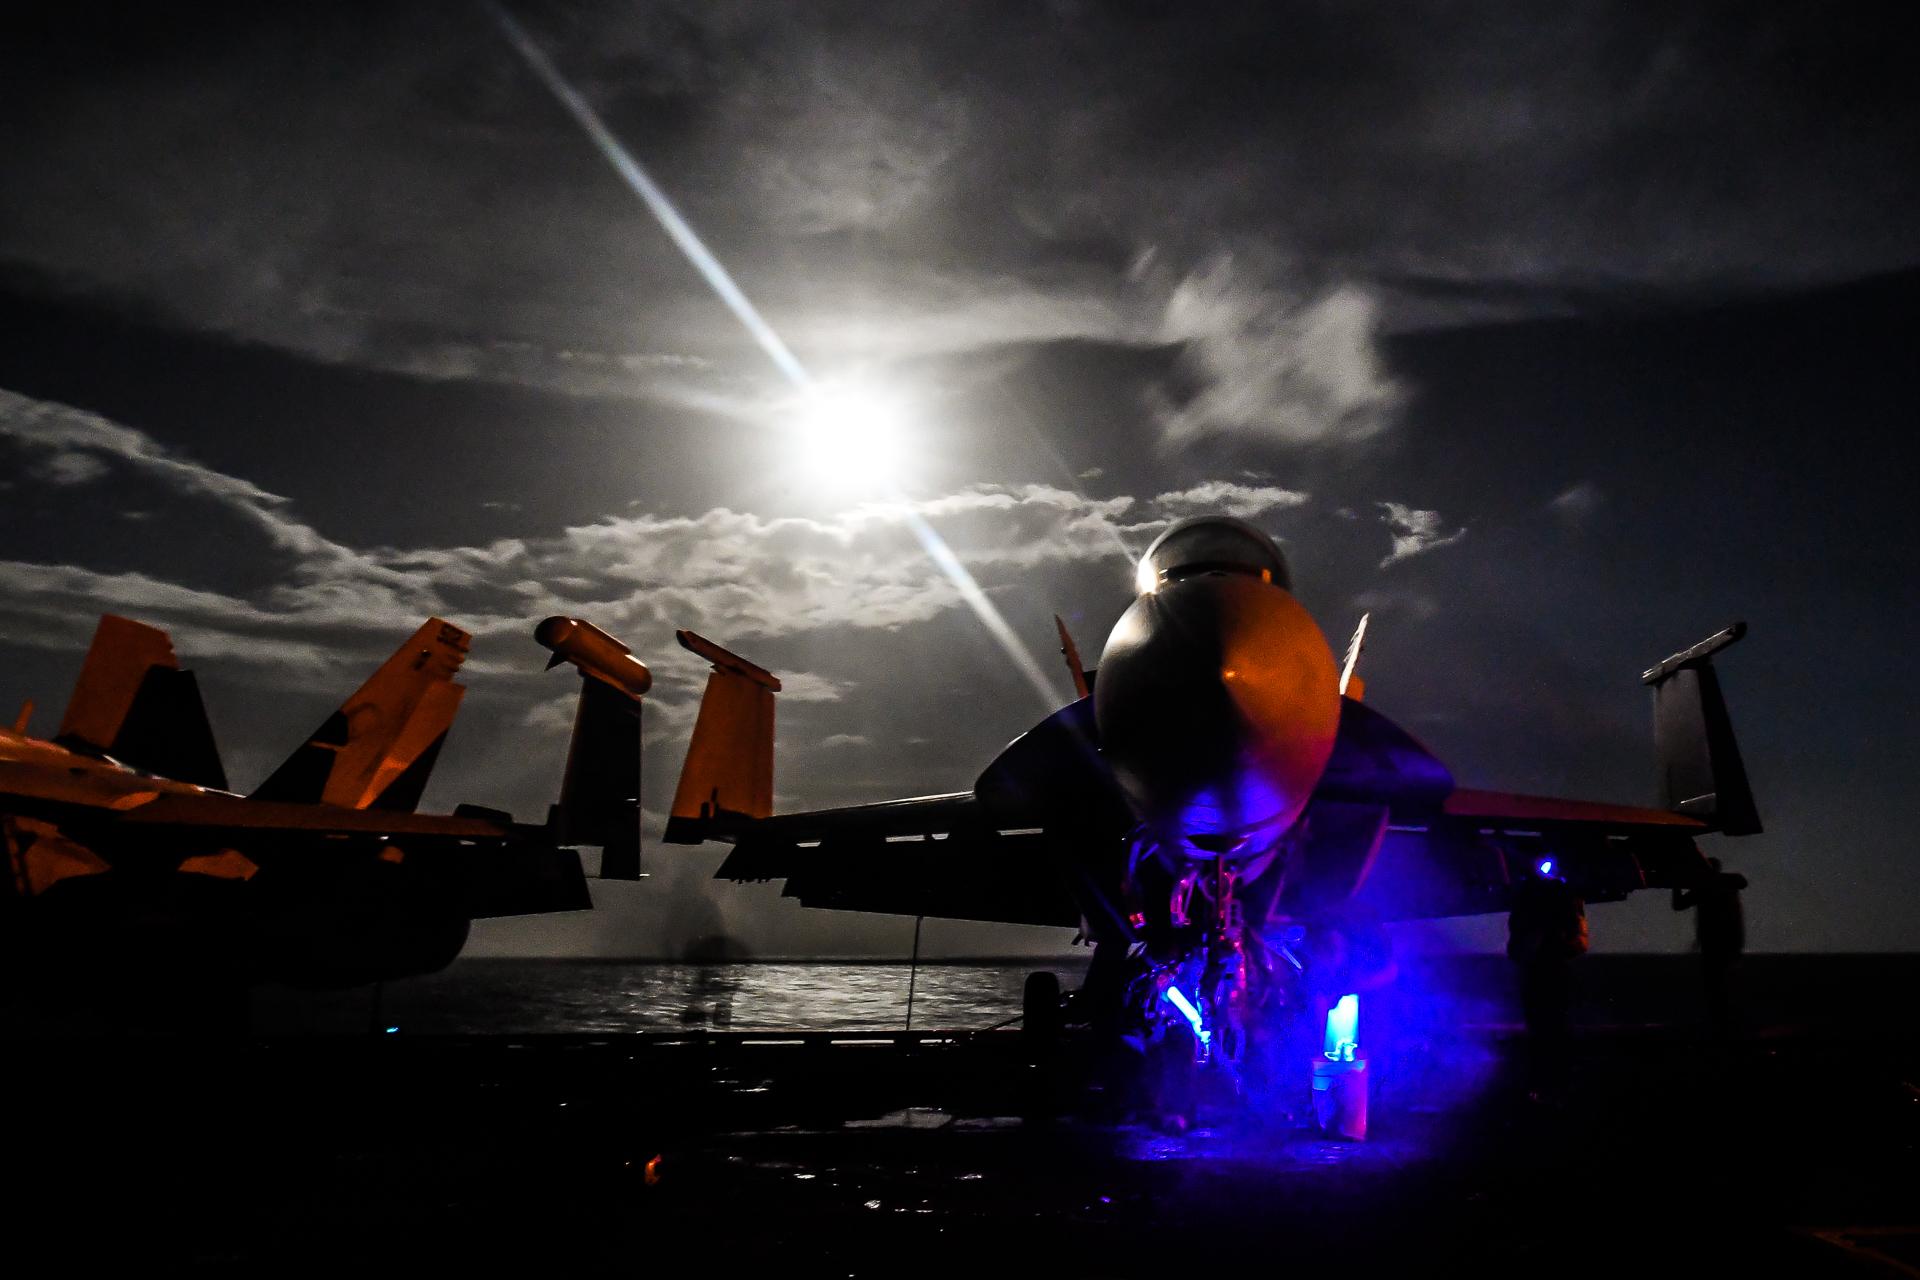 Sailors inspect the landing gear of an F/A-18F Super Hornet, assigned to the